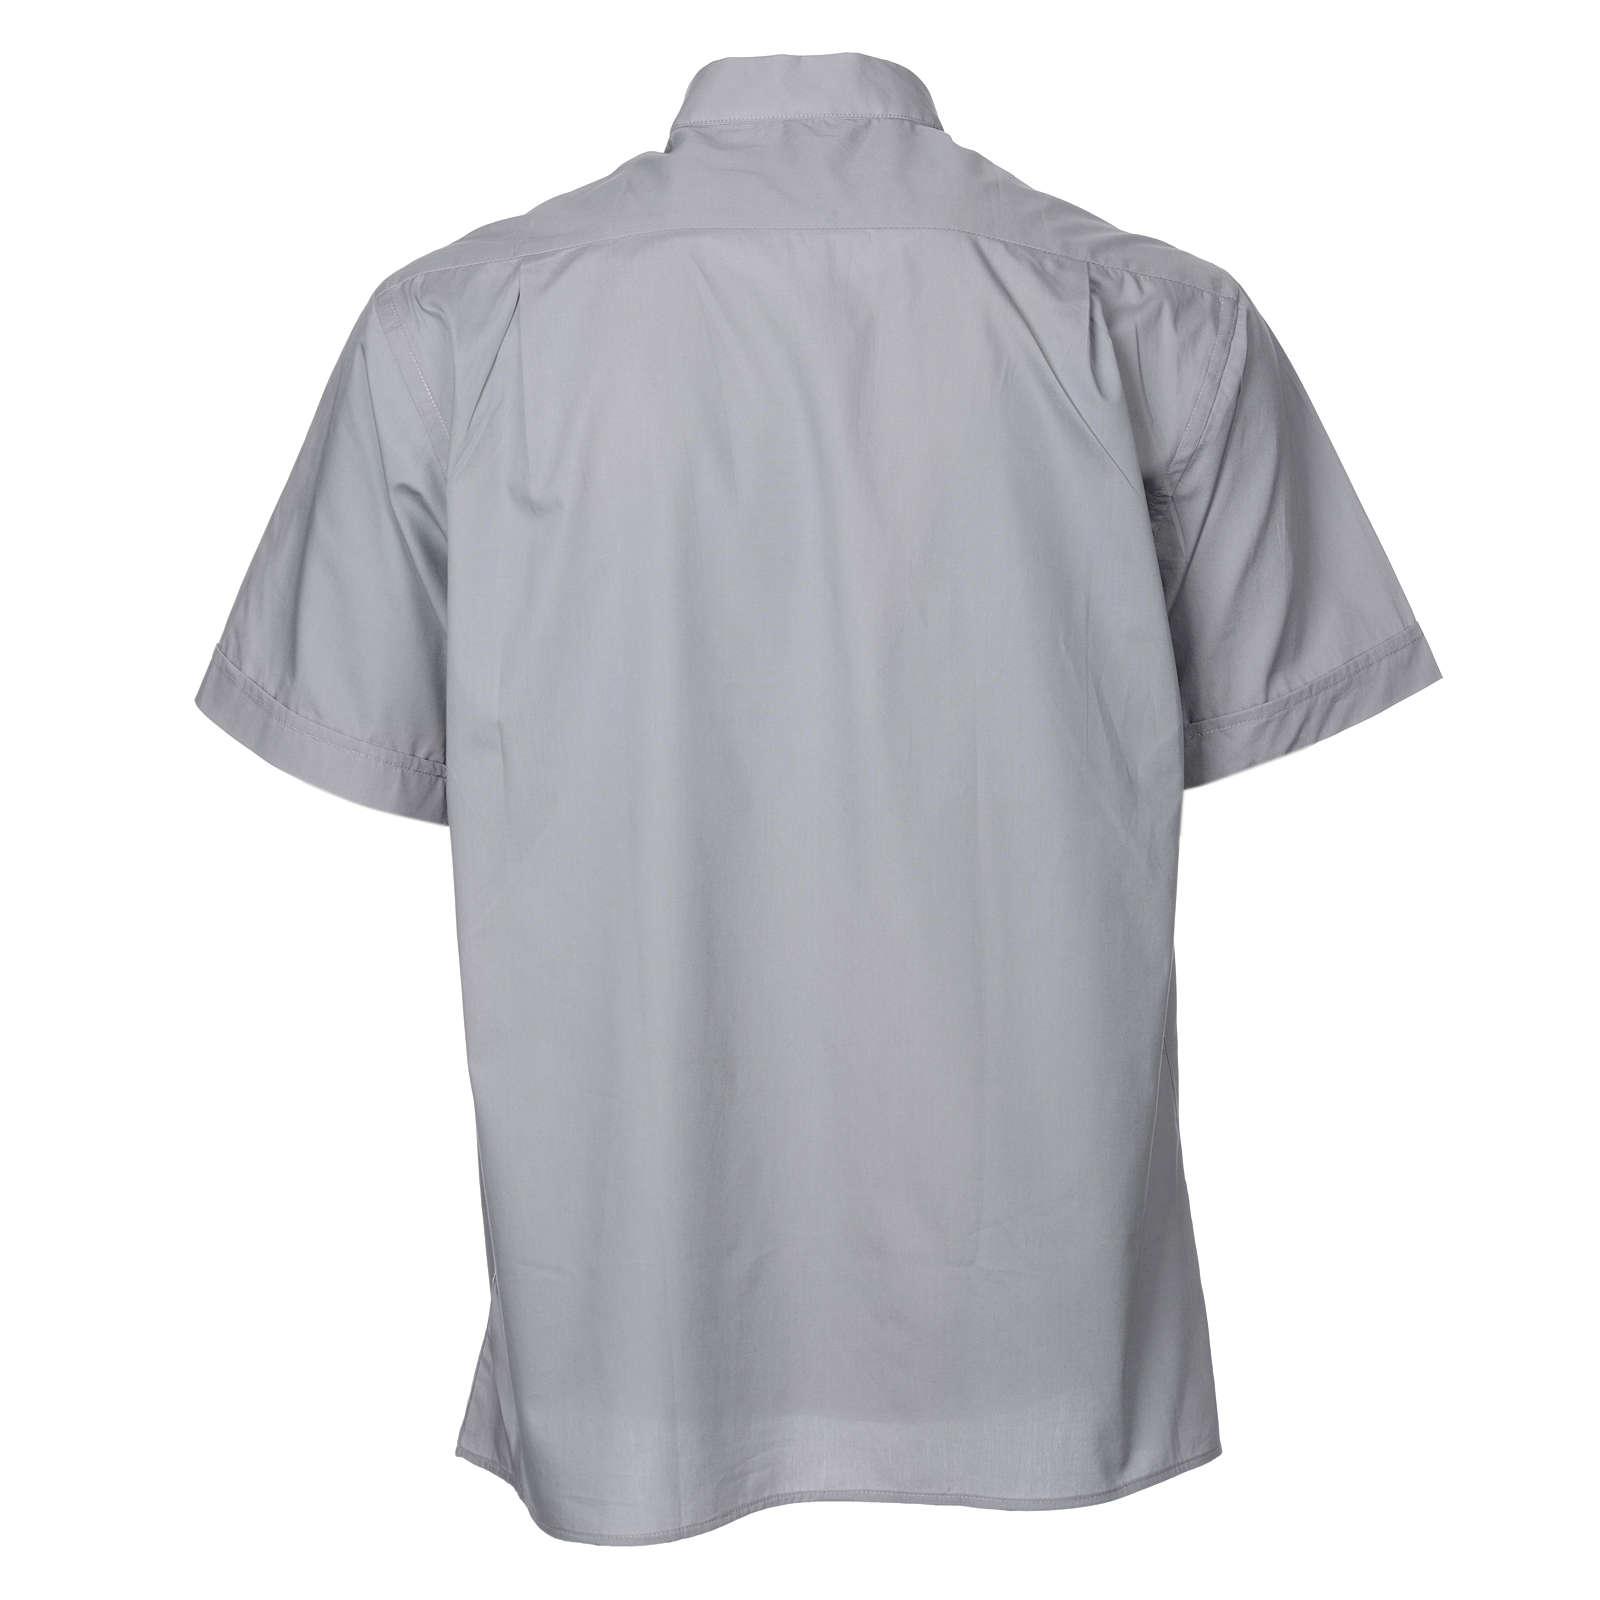 STOCK Camisa manga corta  mezcla de algodón gris claro 4